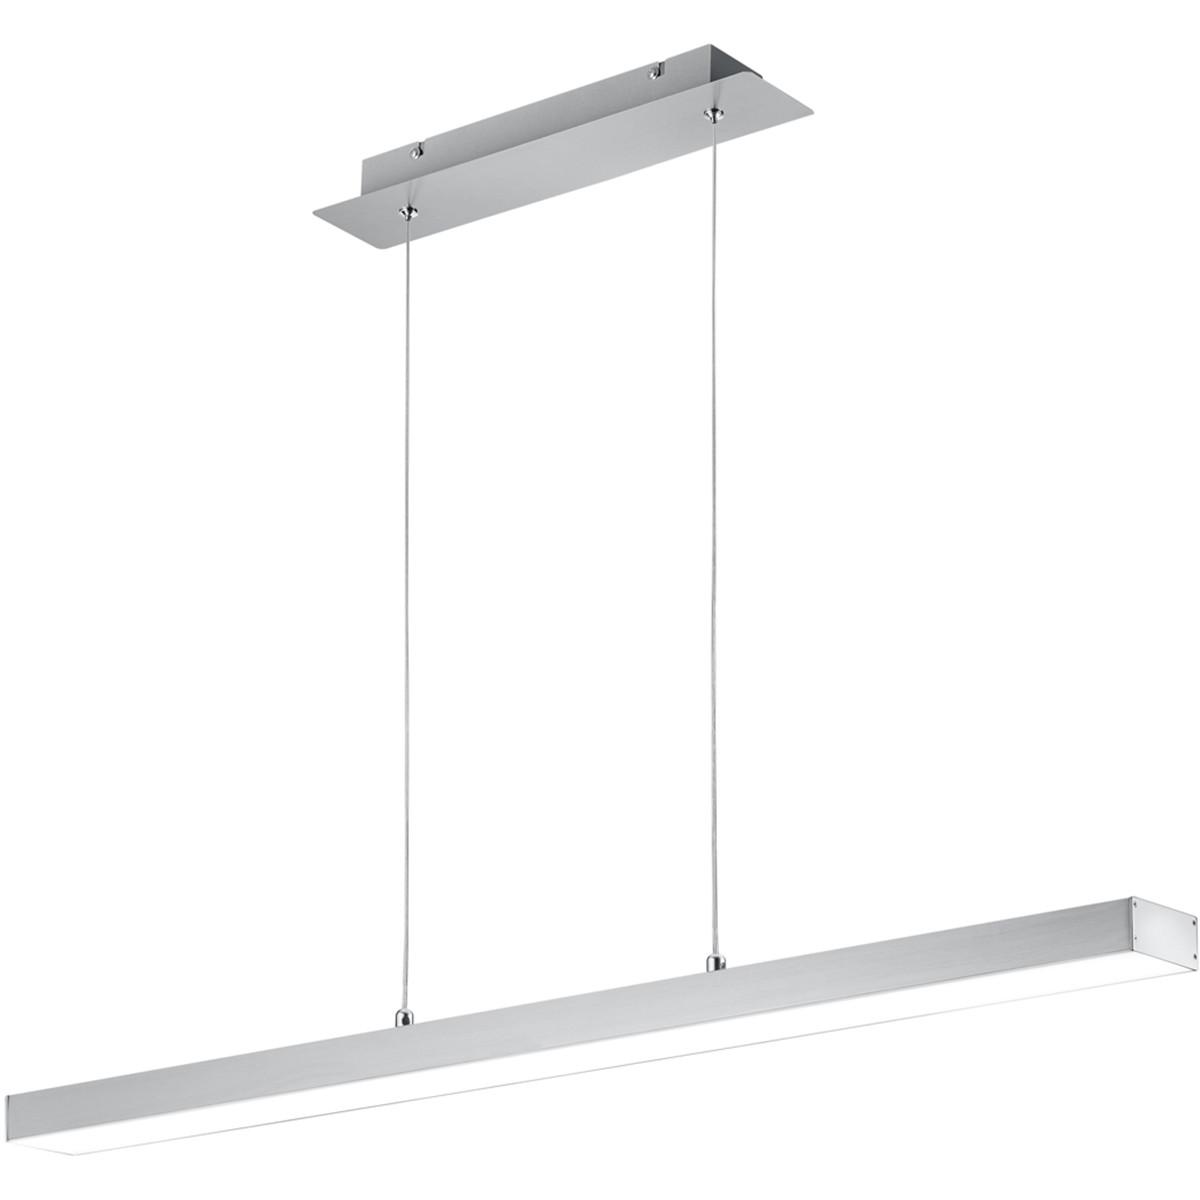 LED Hanglamp - Trion Agina - 18W - Aanpasbare Kleur - Dimbaar - Rechthoek - Mat Nikkel - Aluminium